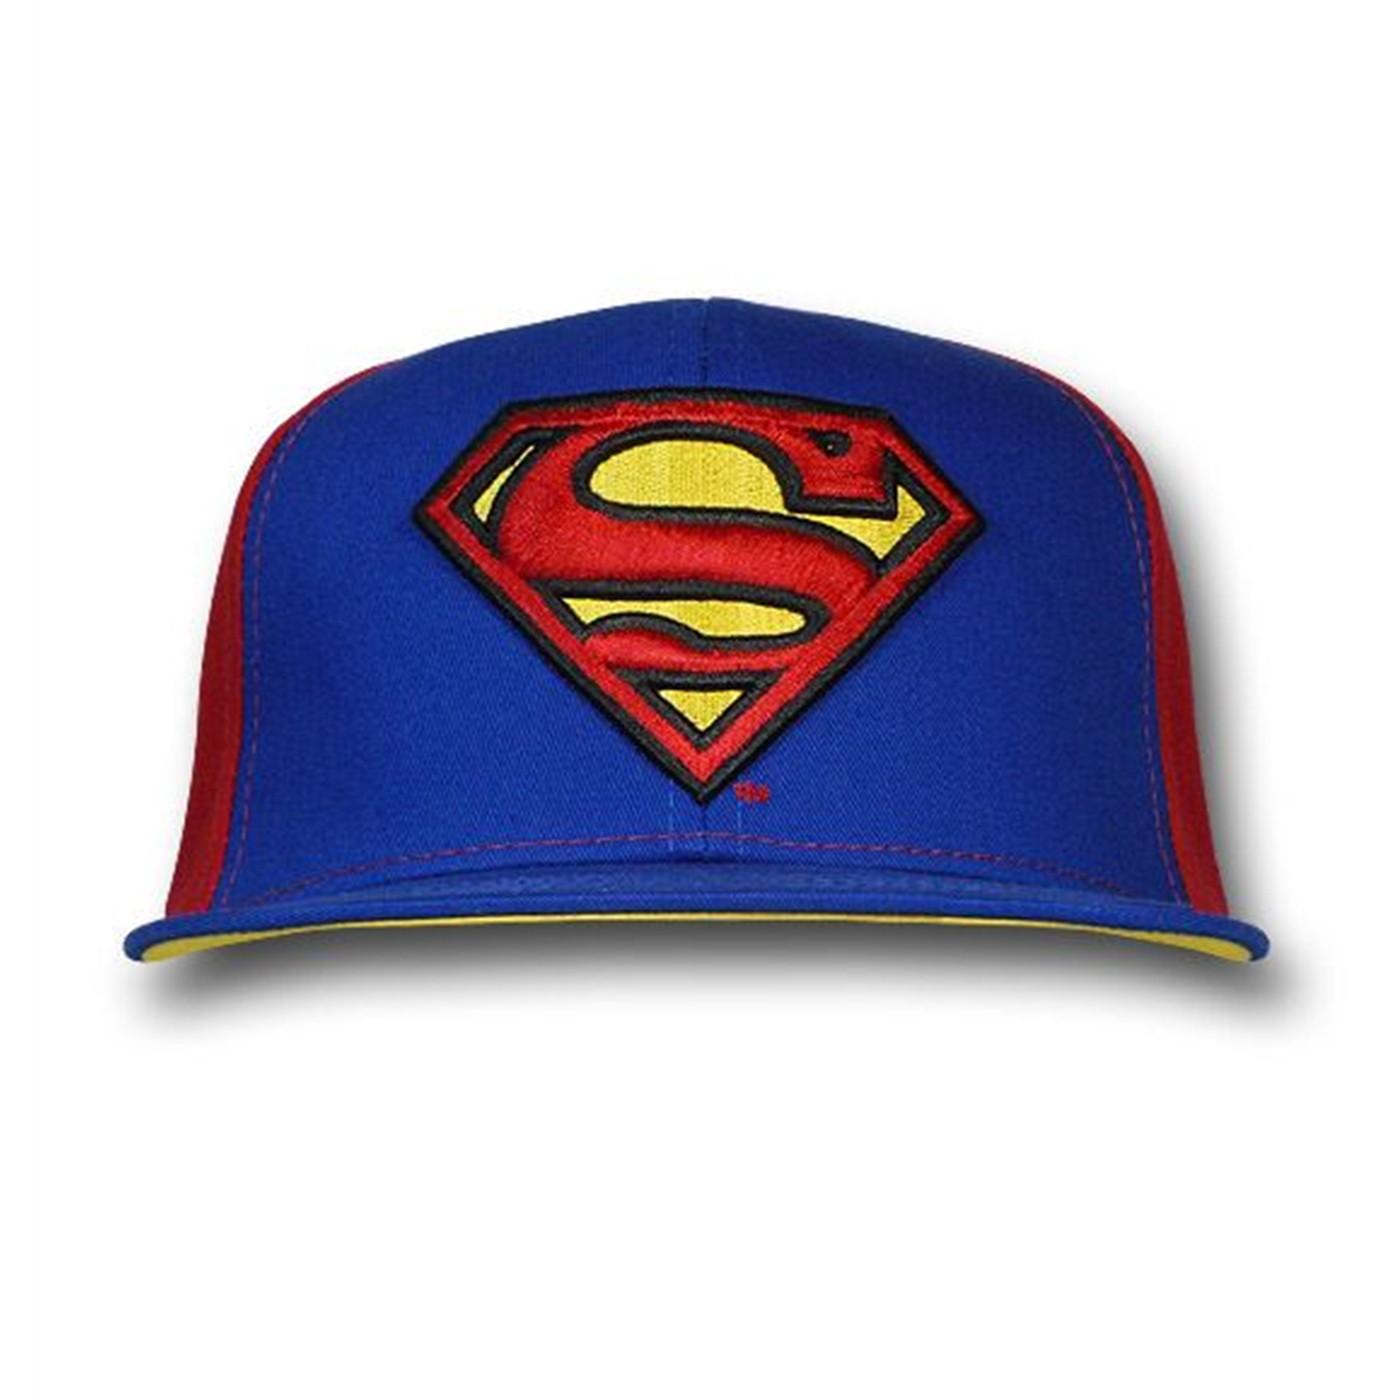 Superman 3D Embroidered Symbol Cap